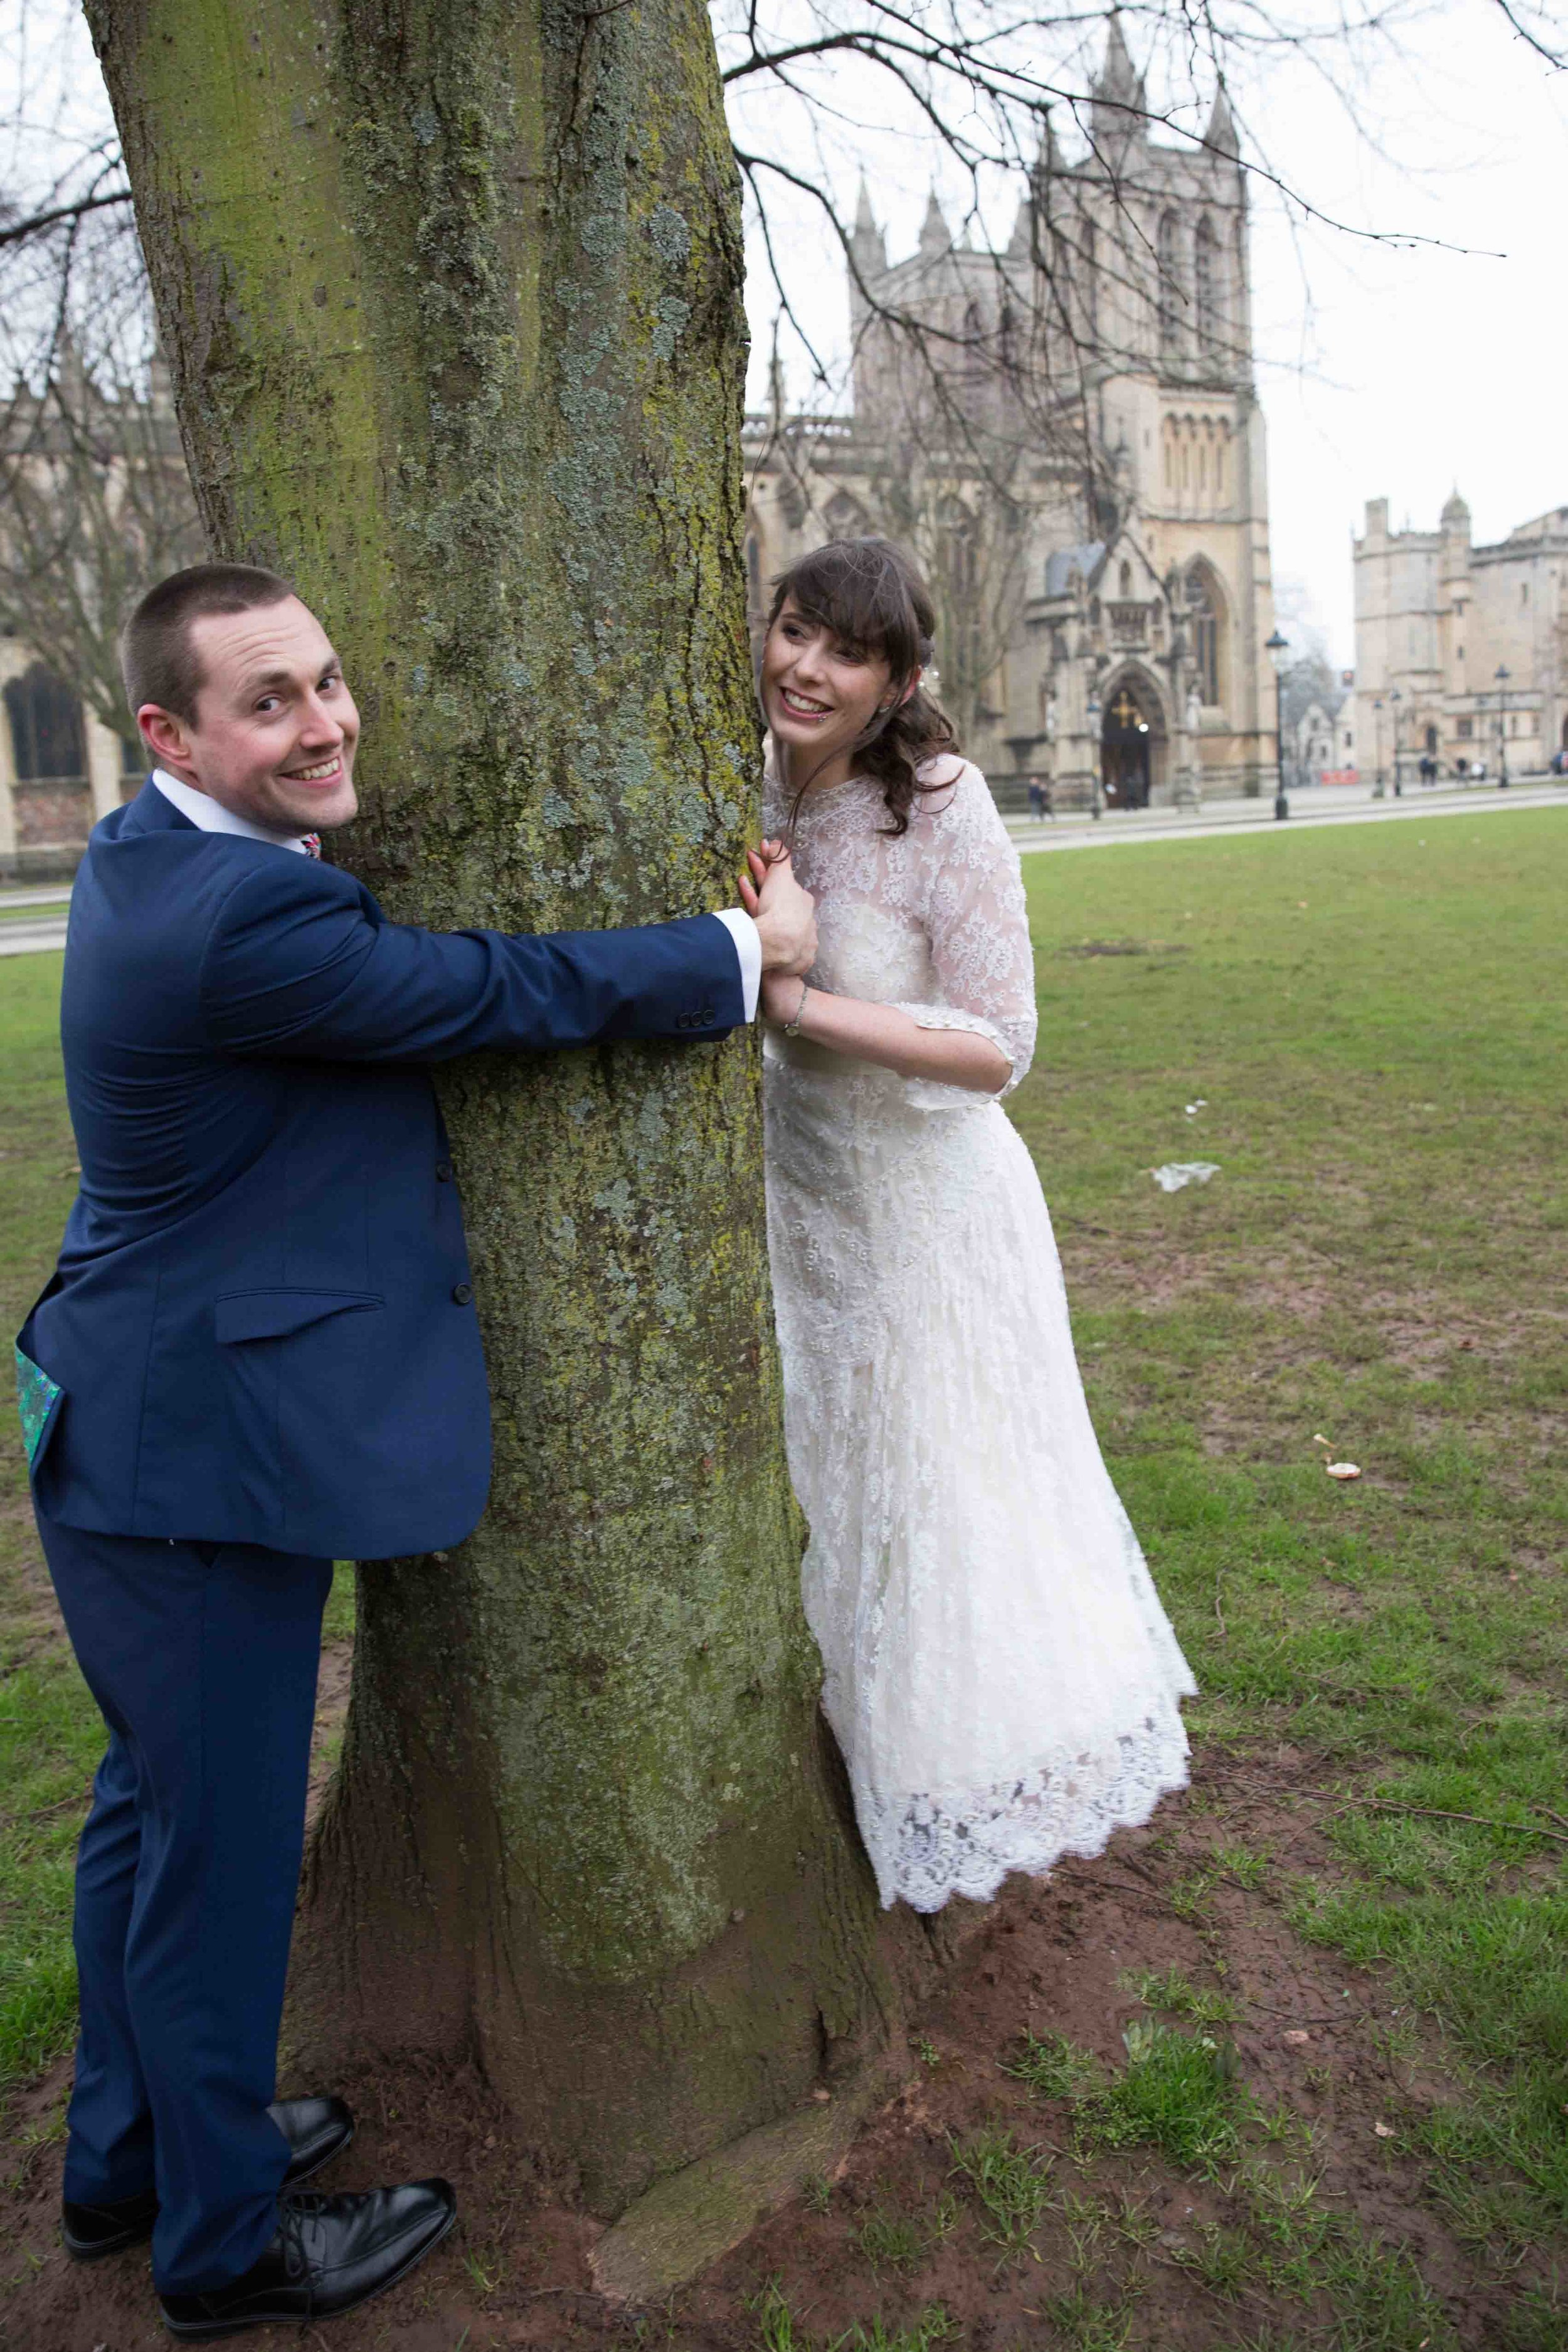 Adam & Faye - Wright Wedding Photography - Bristol Wedding Photographer -279.jpg